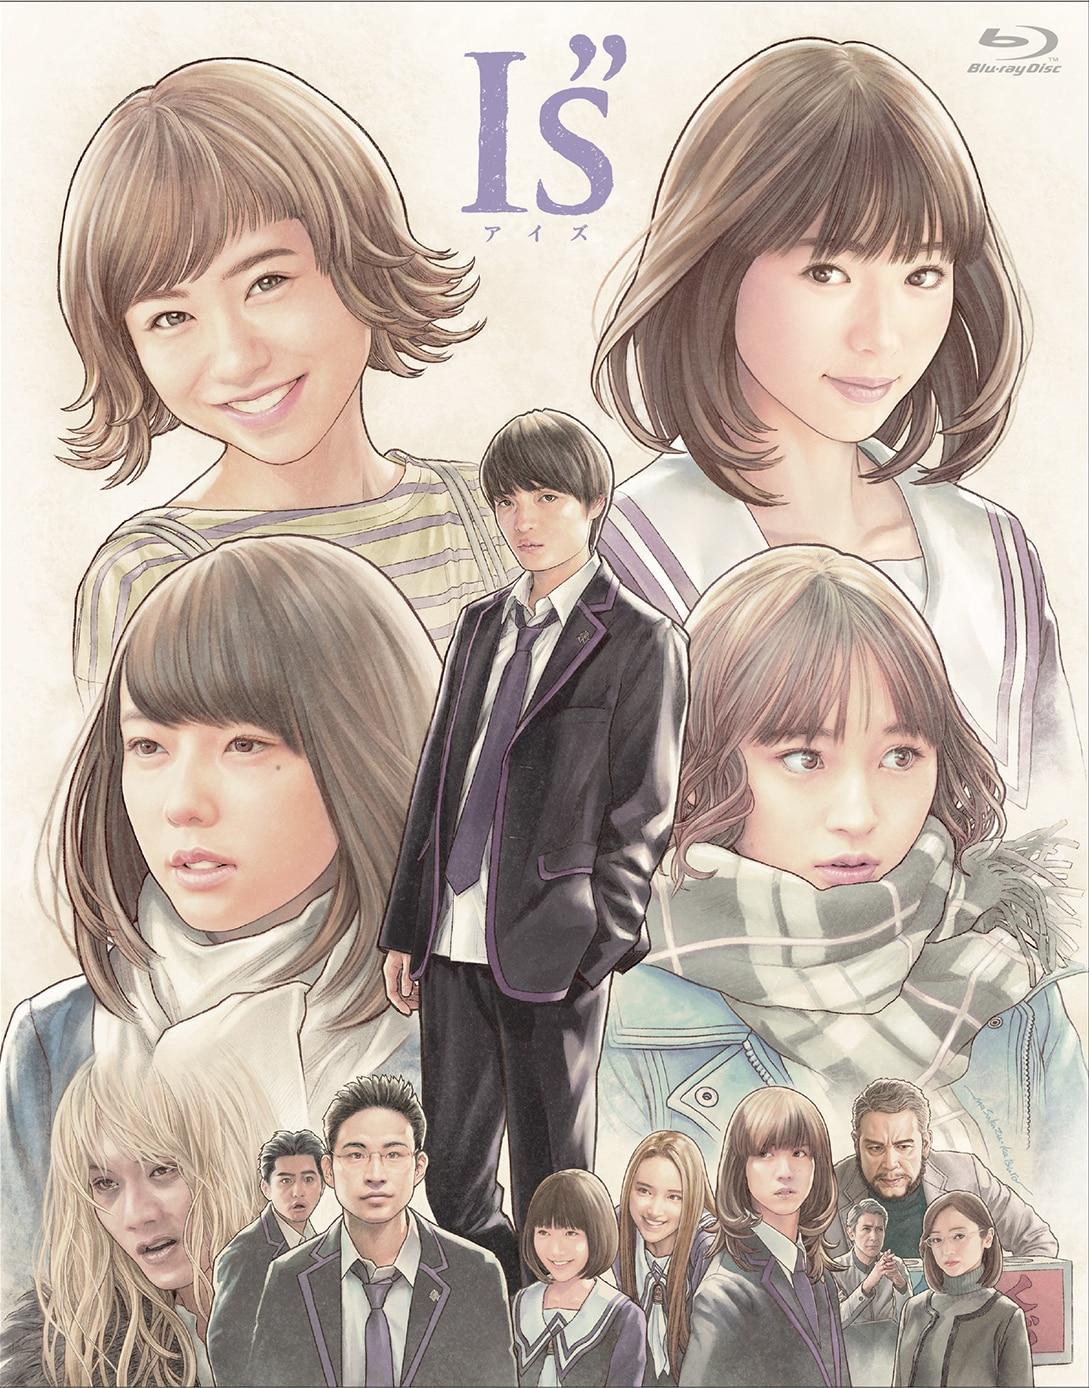 Amazon.co.jp: 4C―Katsura Masakazu illustra: 桂 正和 ...